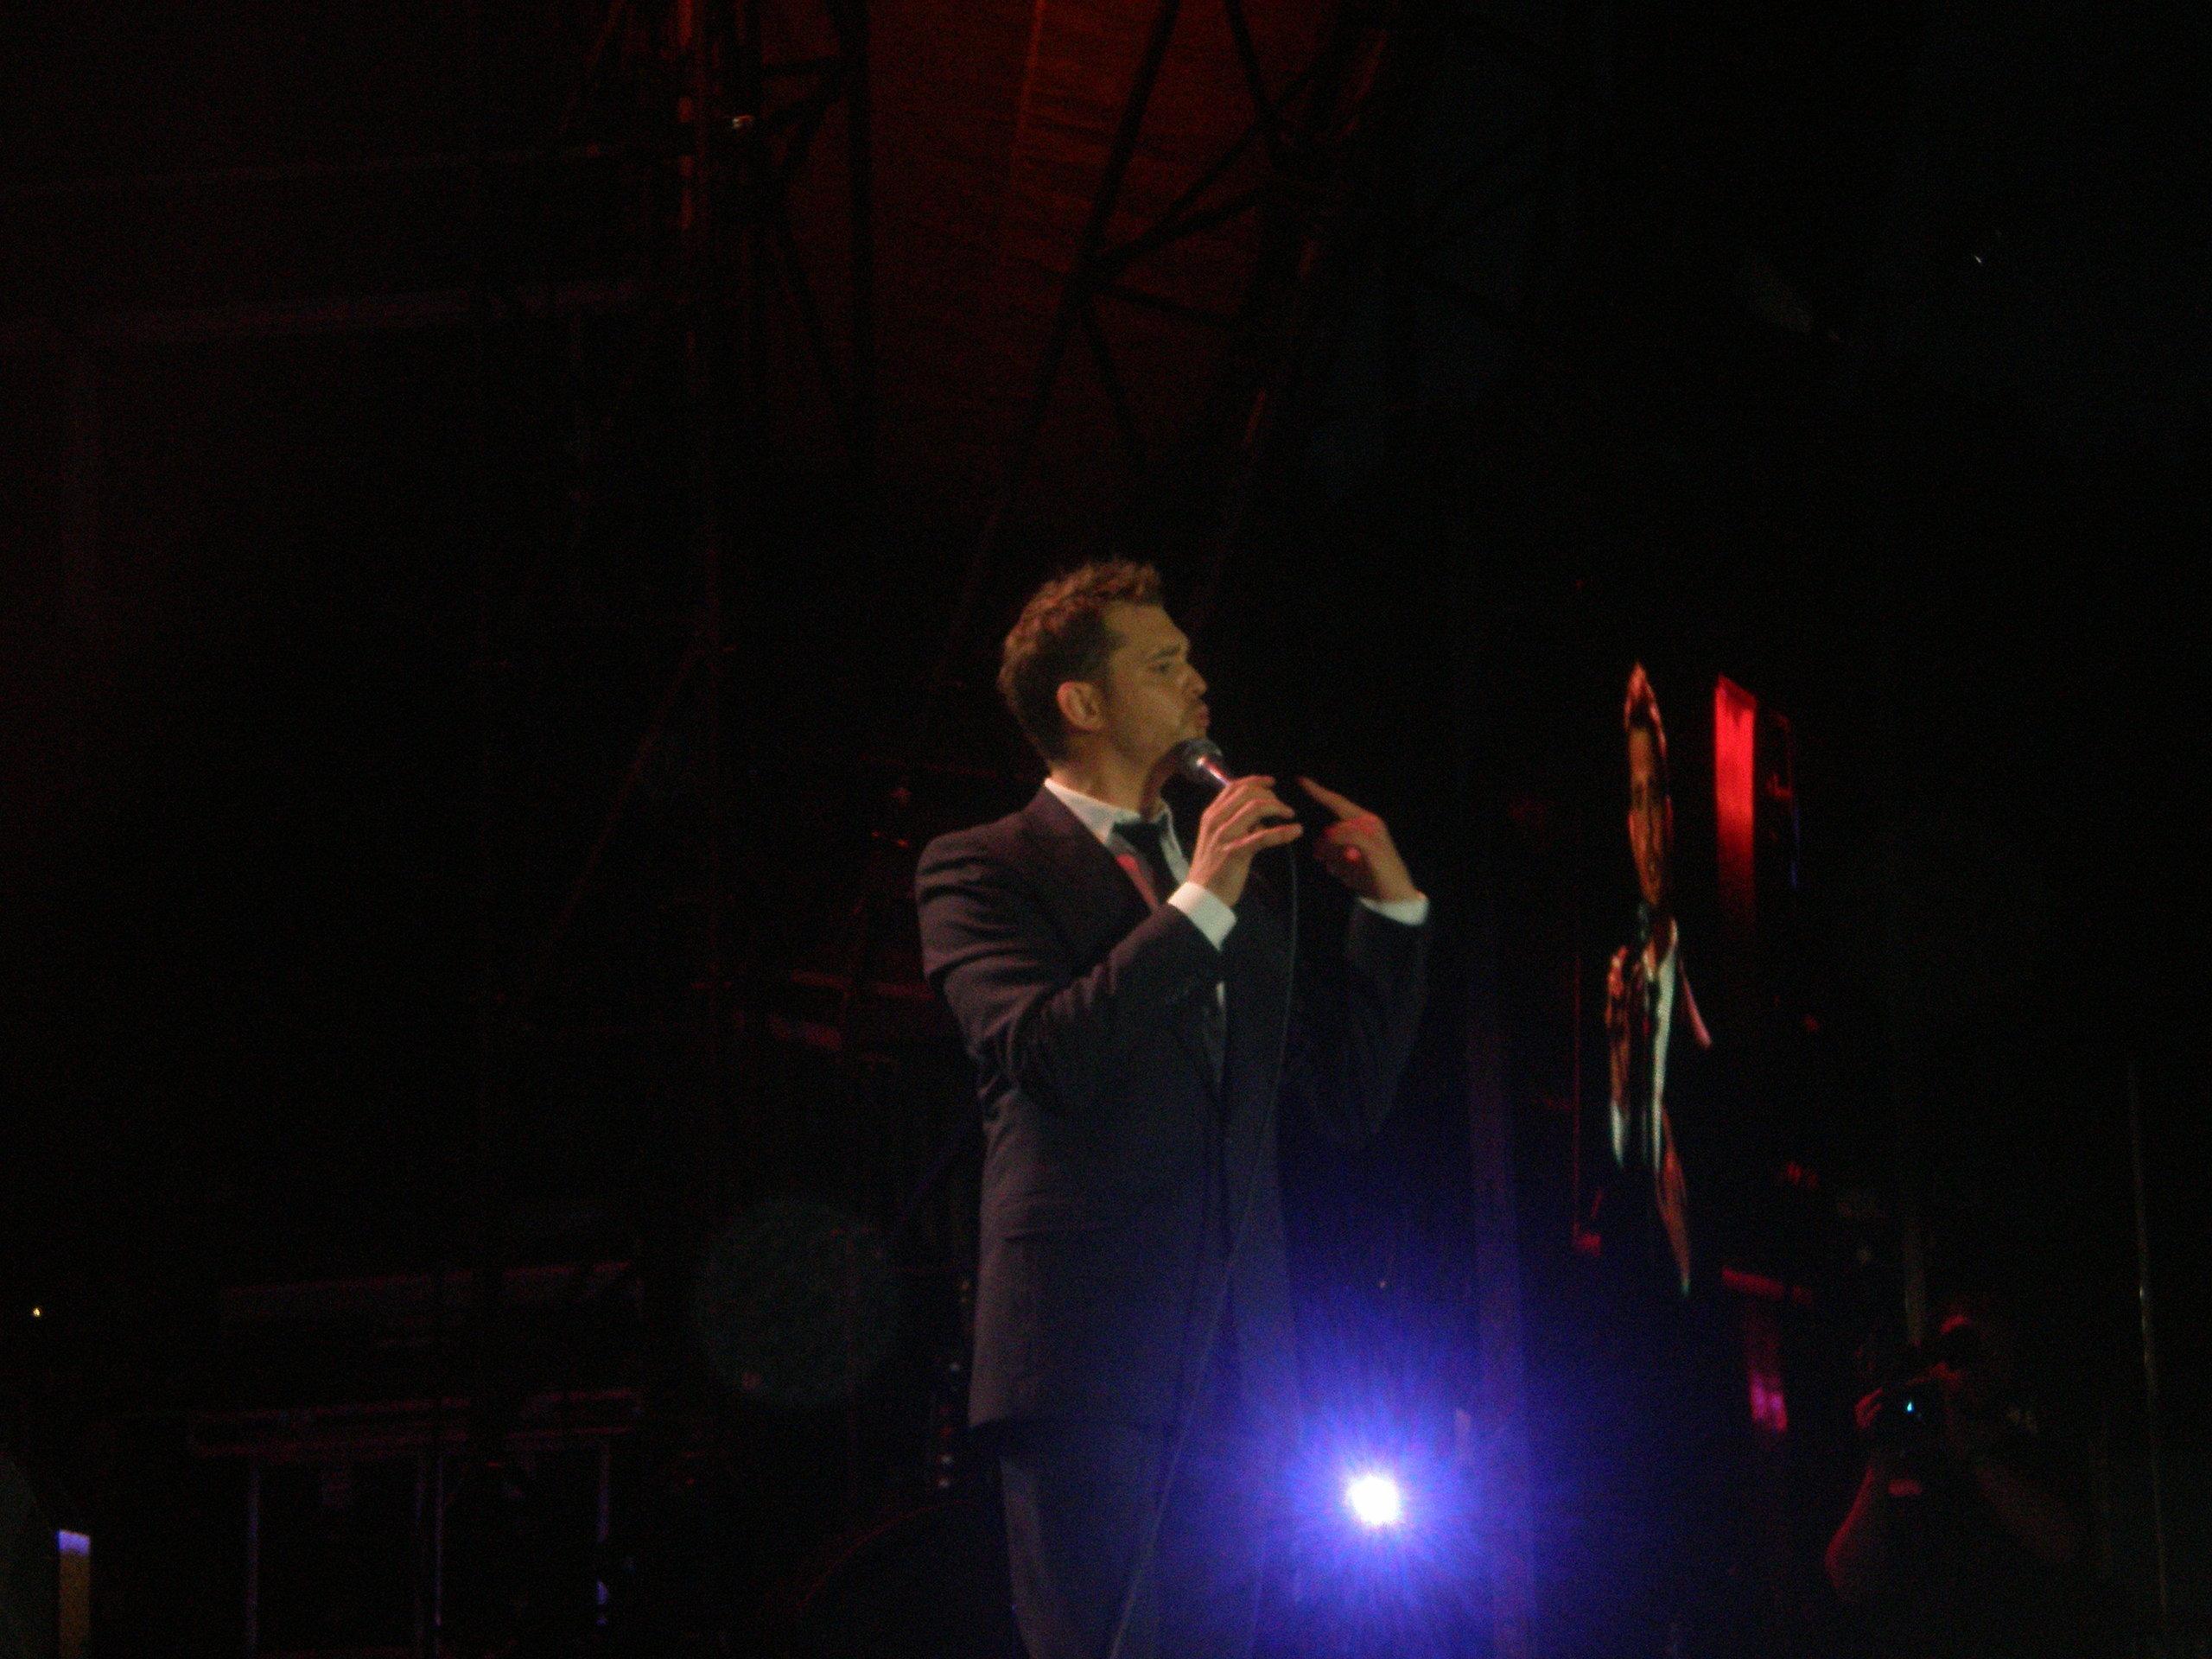 Michael Bublé-Dublin buổi hòa nhạc